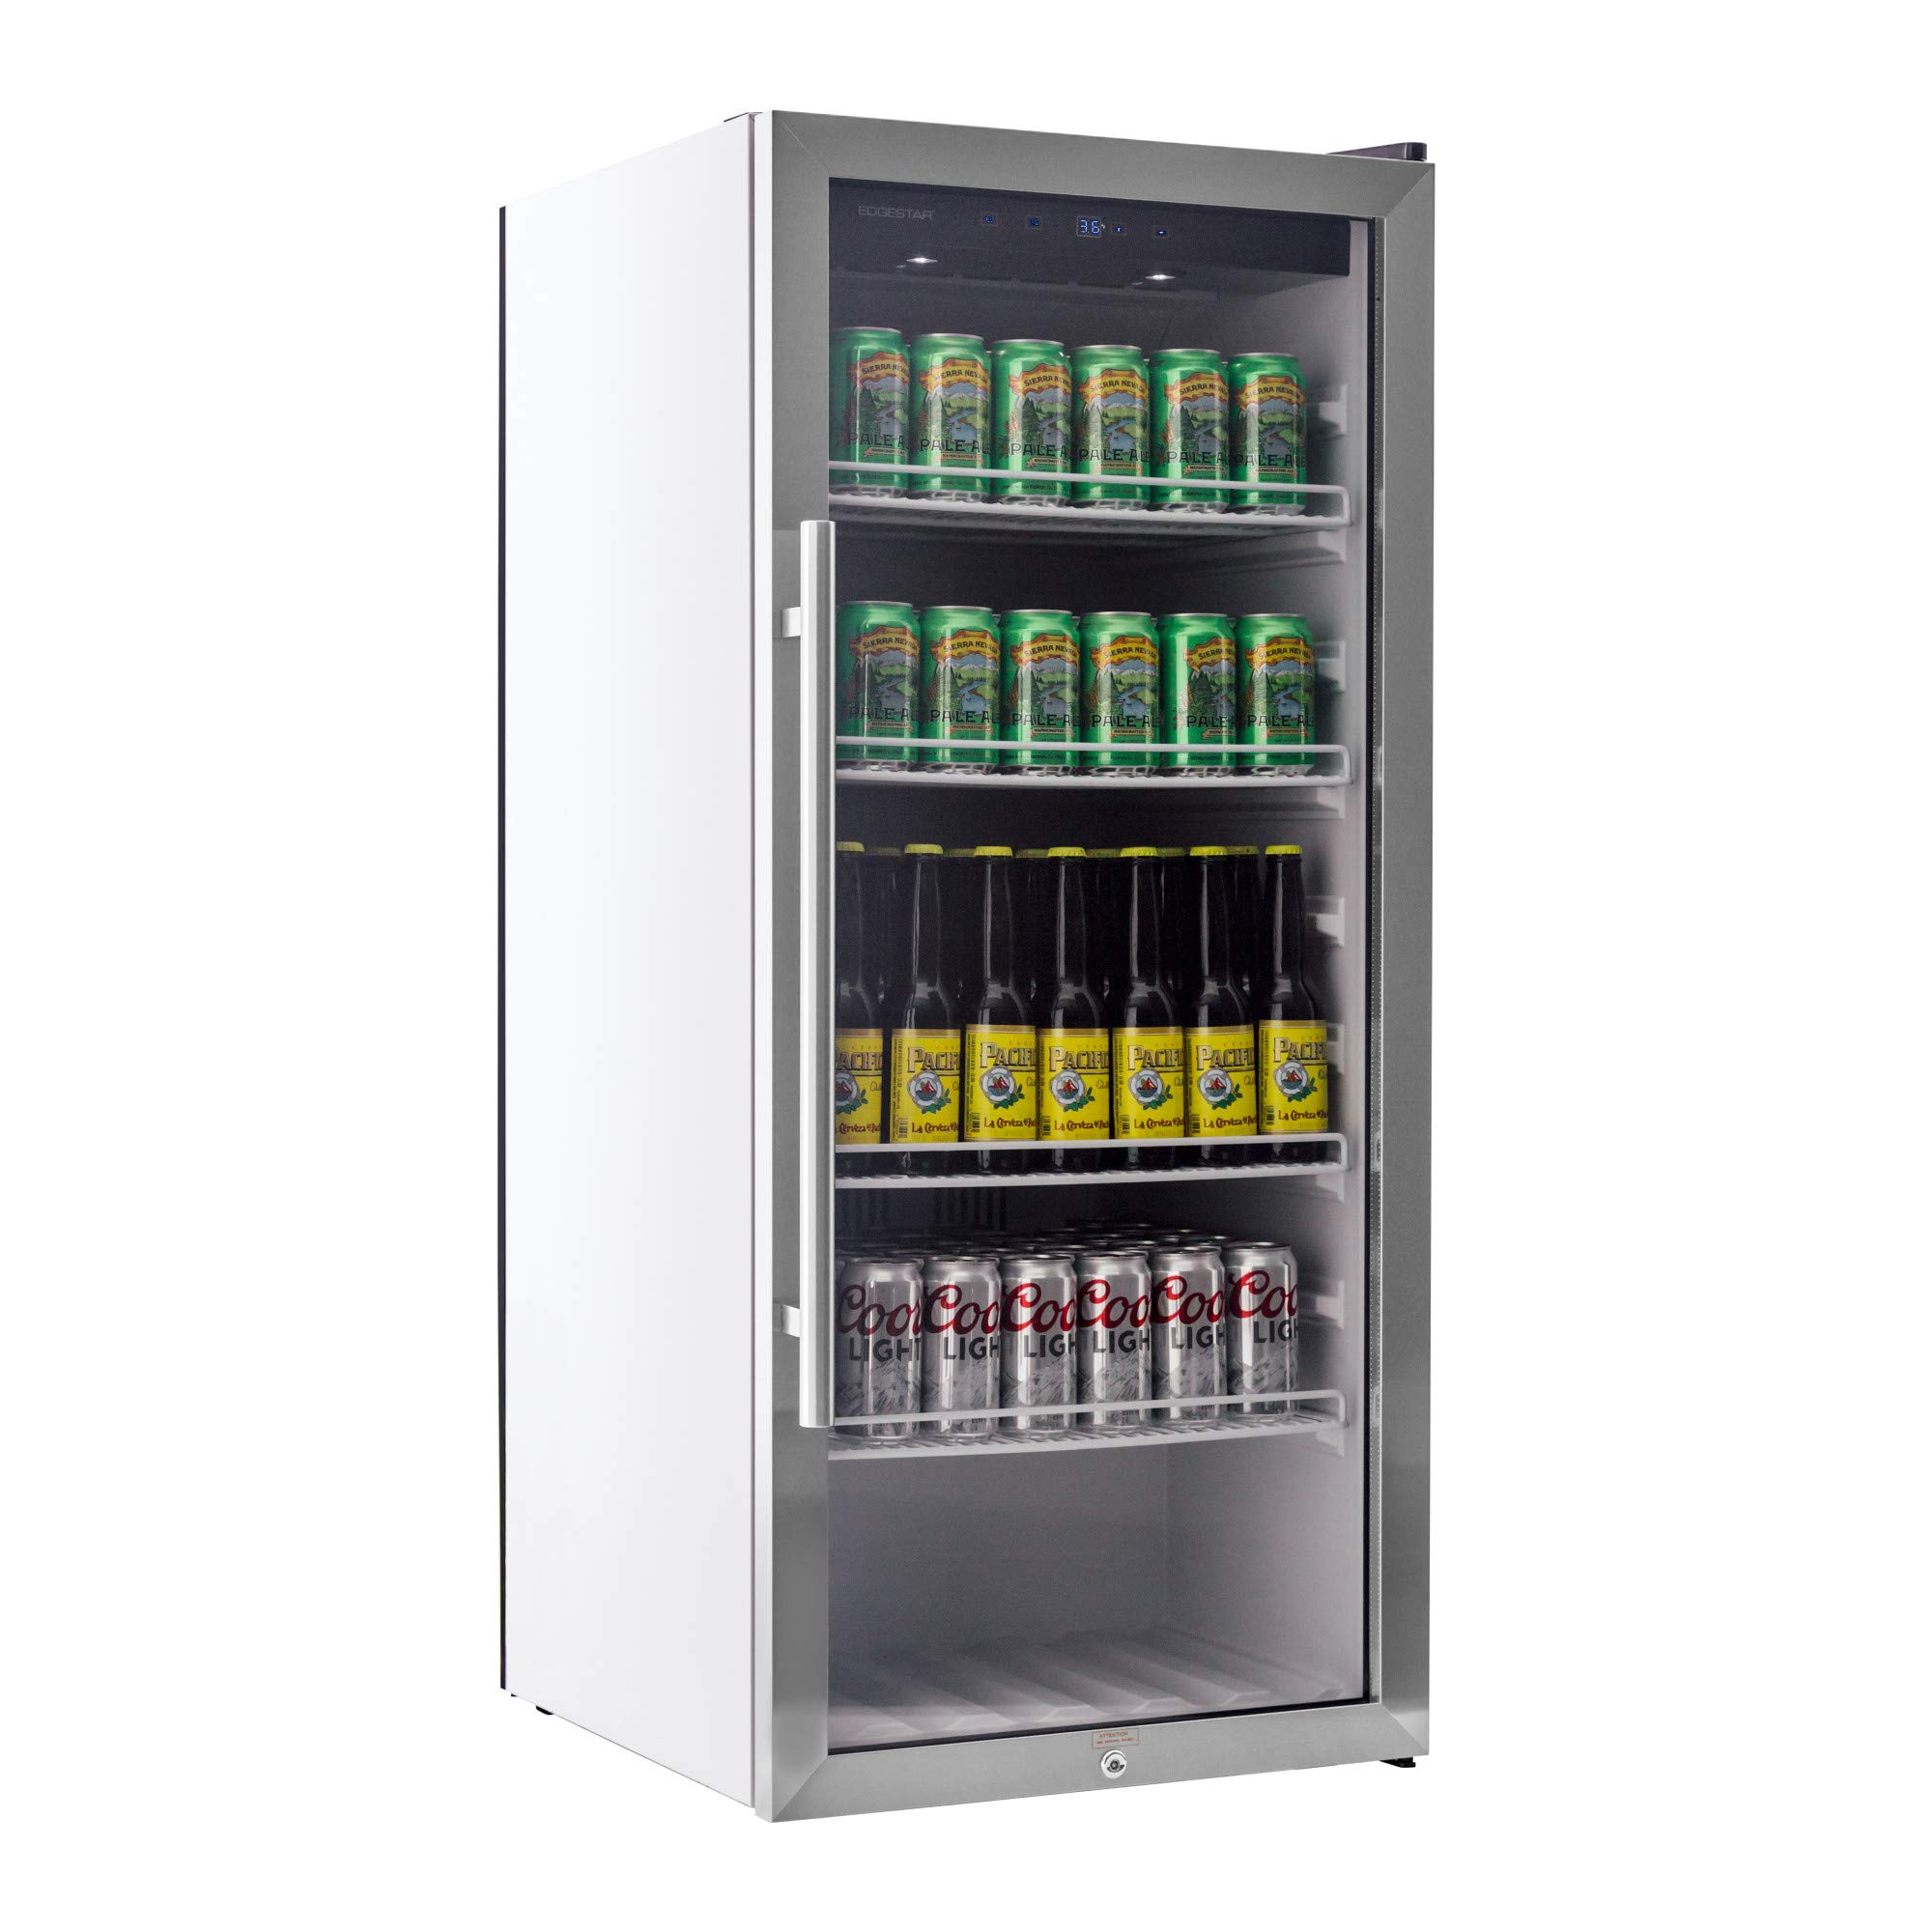 EdgeStar VBR240 Stainless Steel 22 Inch Wide 8.6 Cu. Ft. Commercial Beverage Merchandiser with Temperature Alarm by EdgeStar